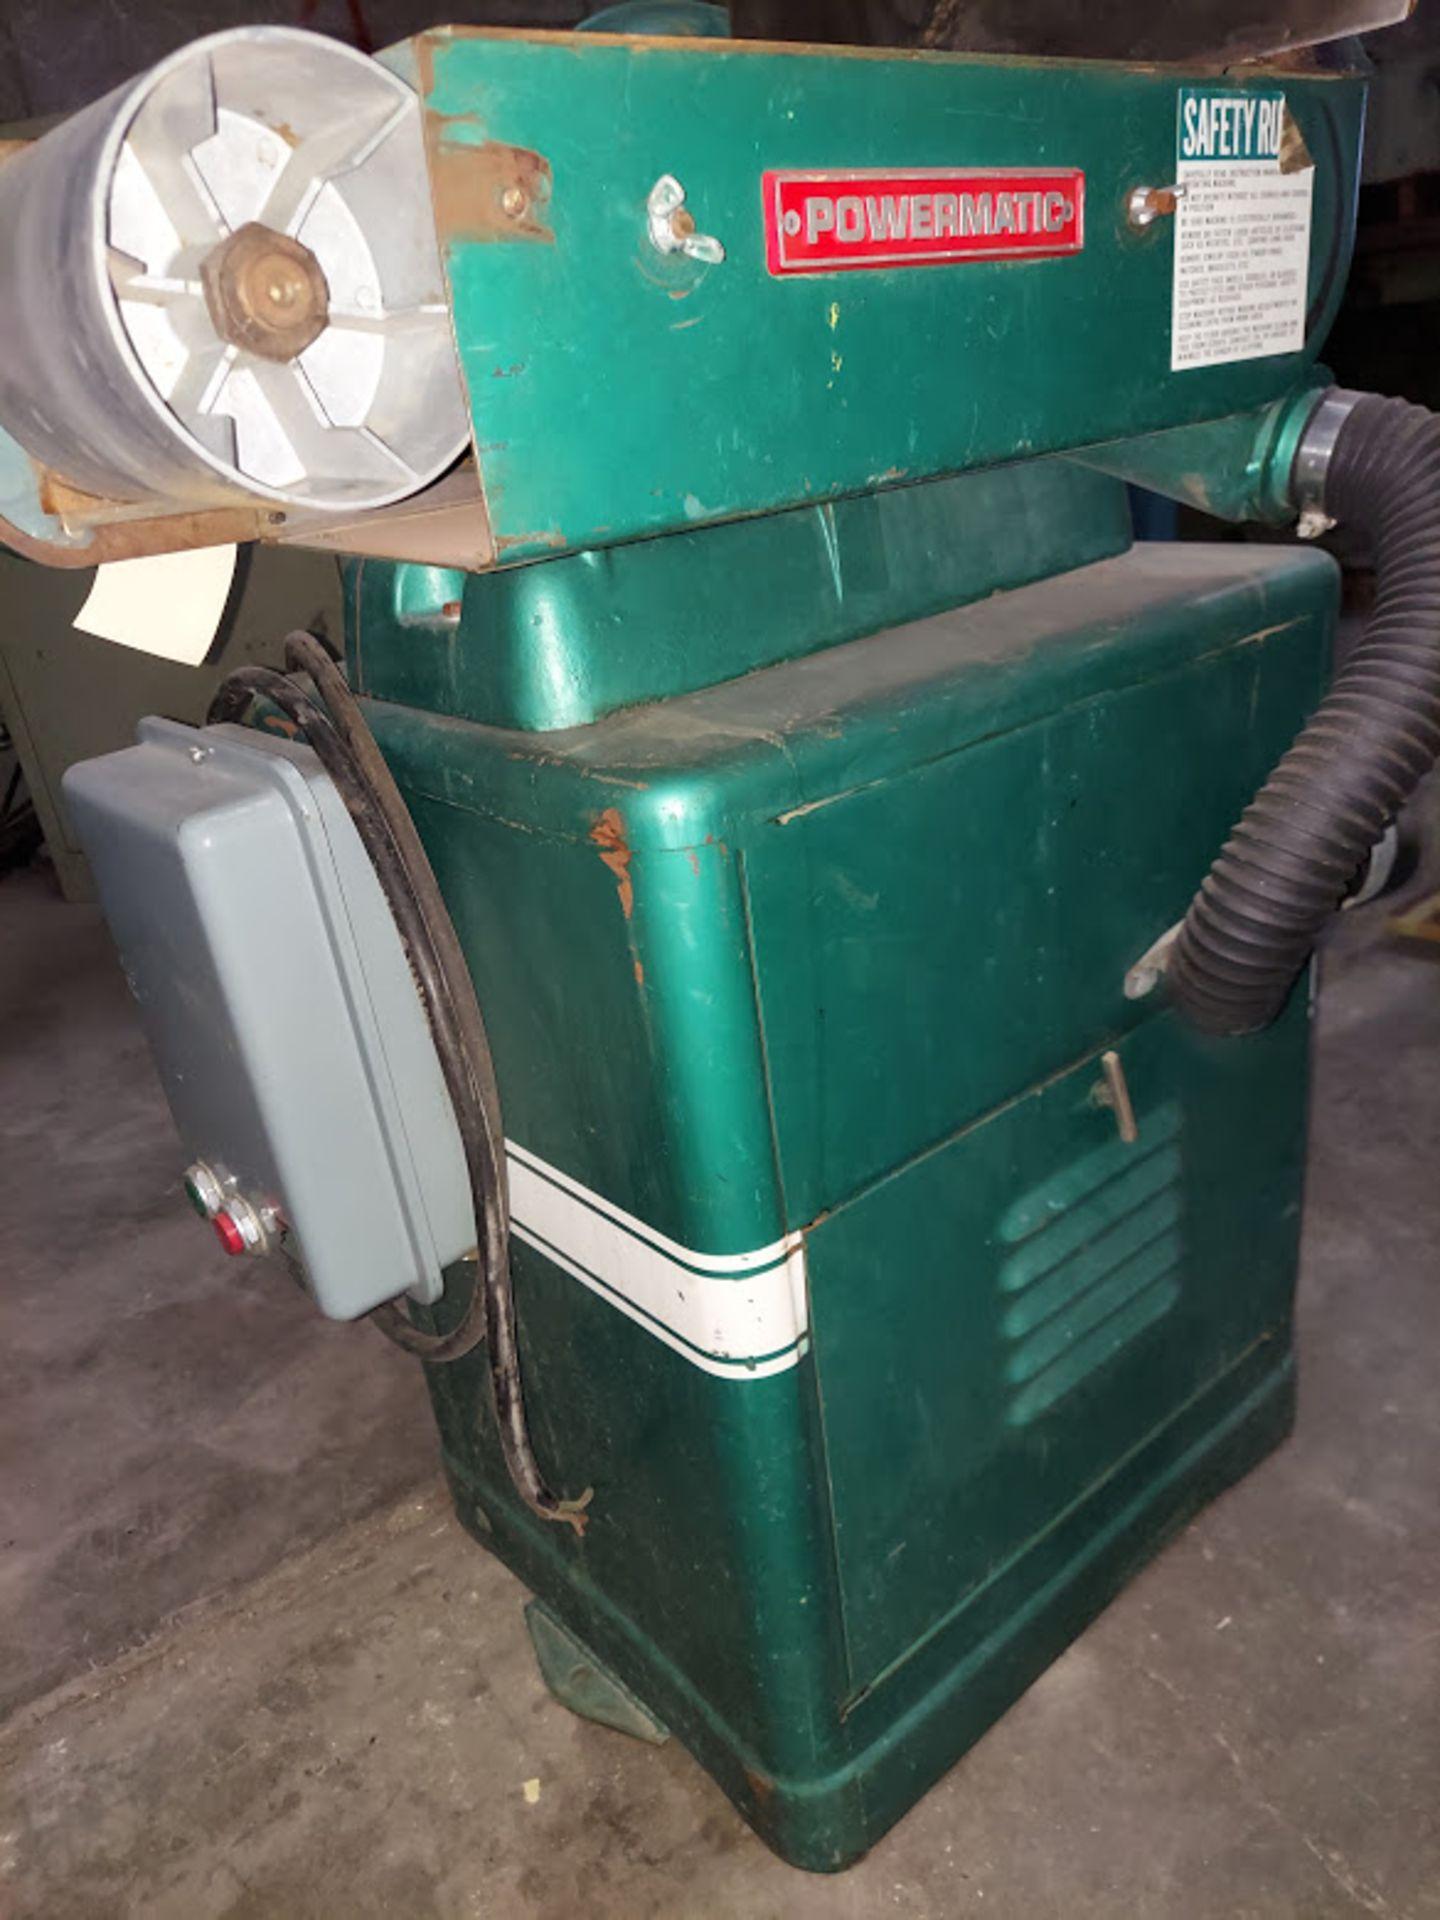 "Powermatic 6"" x 48"" Belt & 12"" Disc Sander, Model #30, 115/230 Volts 1 Phase Motor - Image 3 of 5"